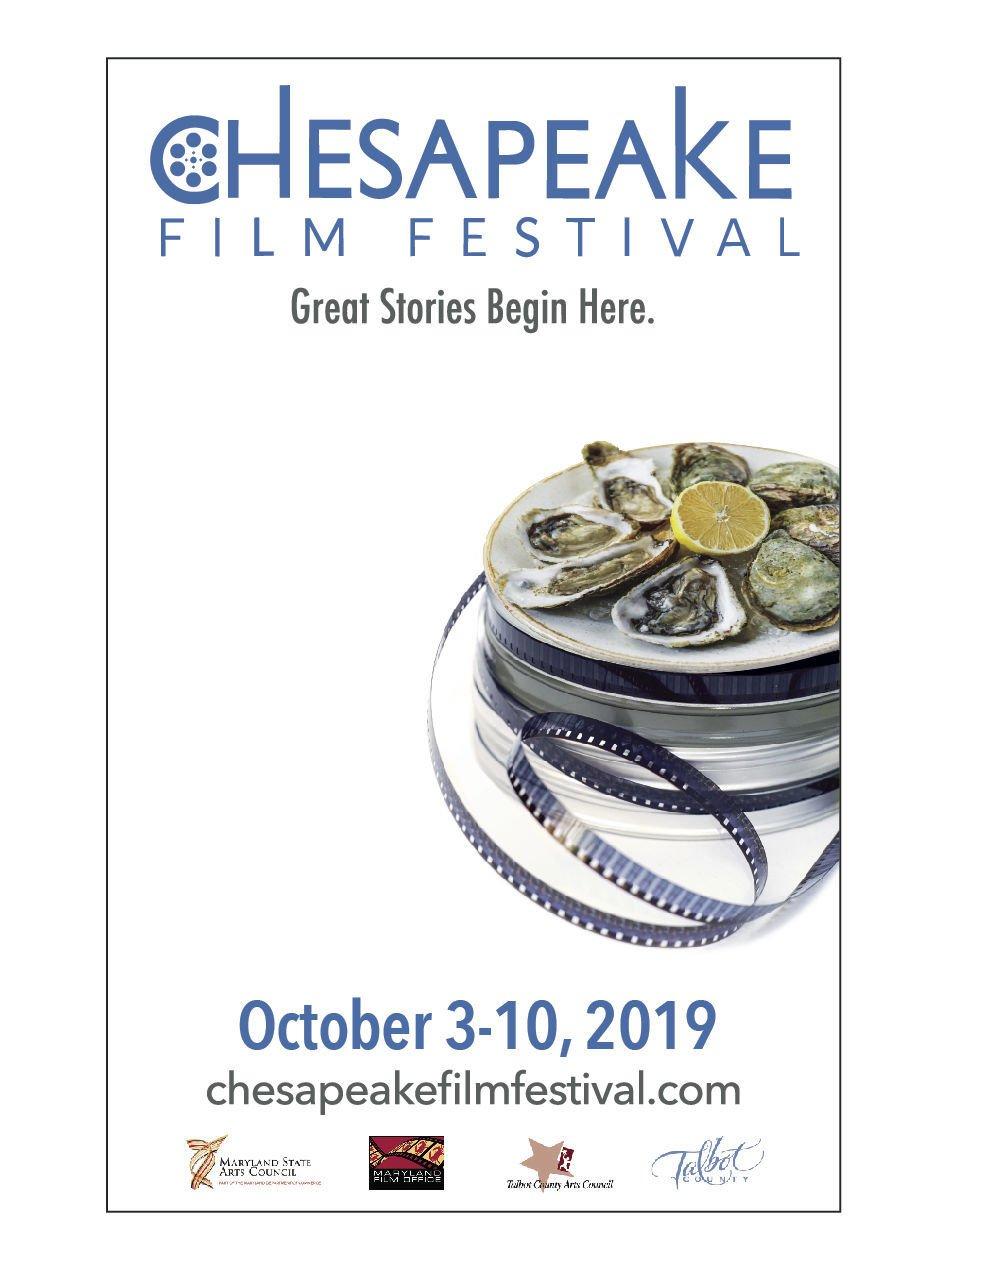 Chesapeake Film Festival